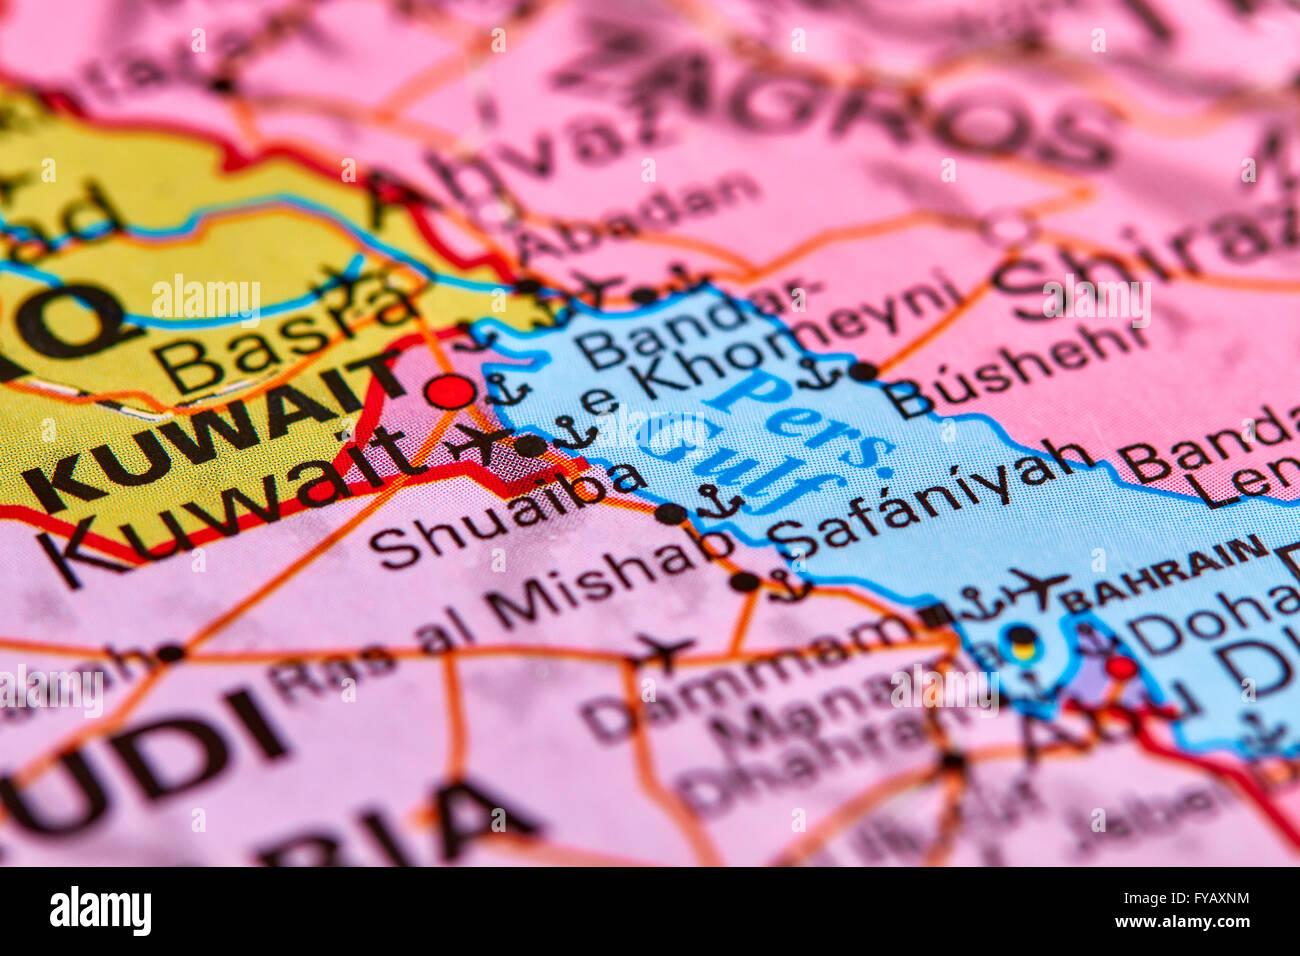 Persian Gulf on the World Map - Stock Image